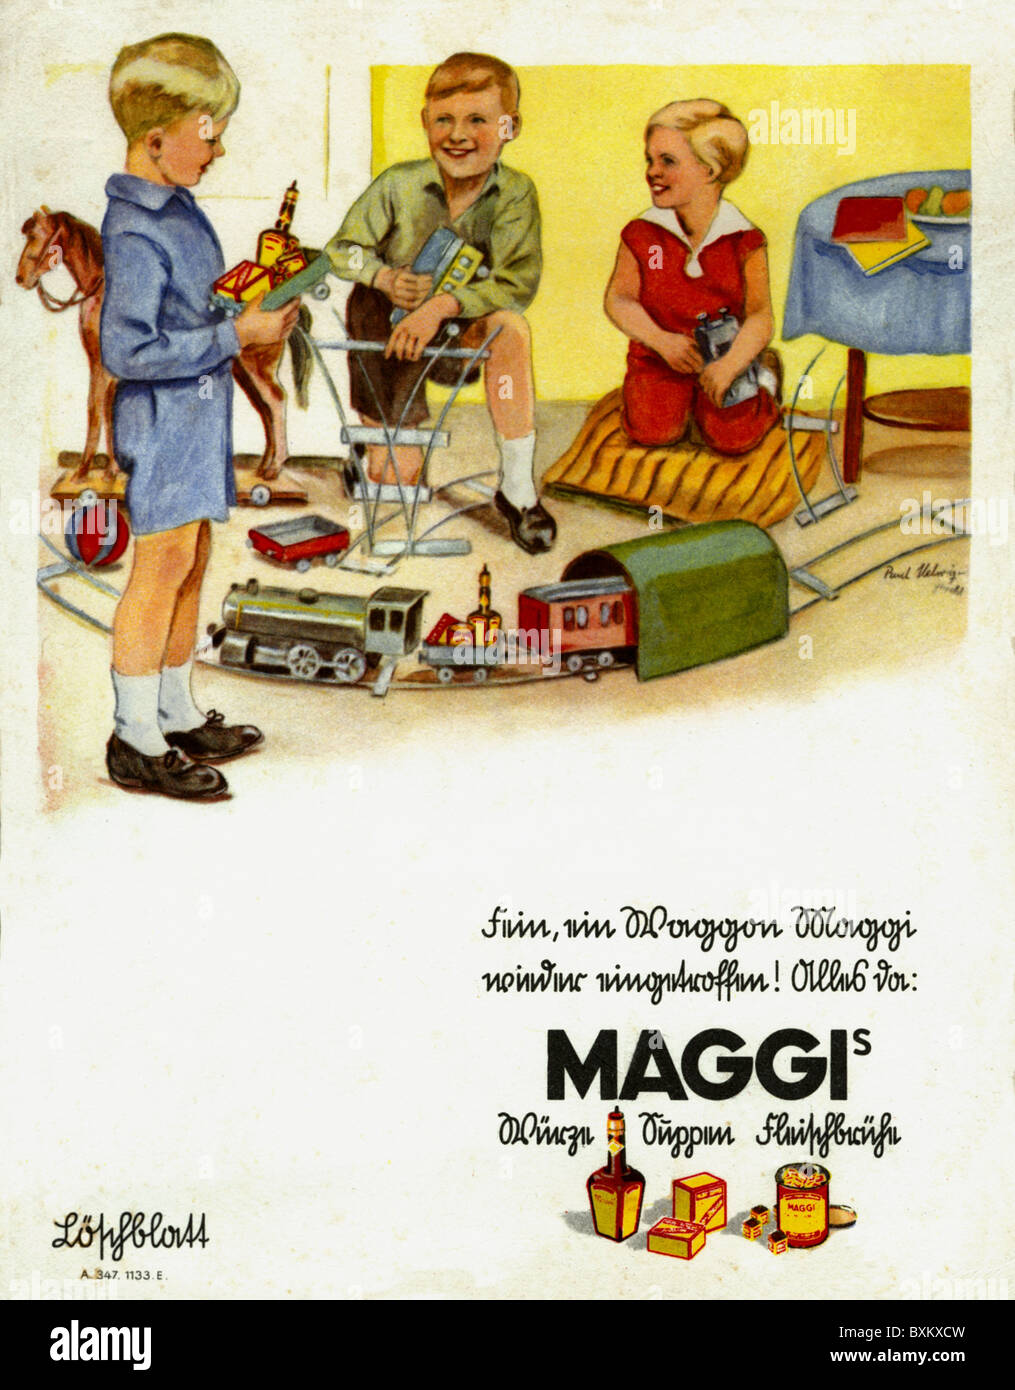 Maggi advertising stockfotos bilder